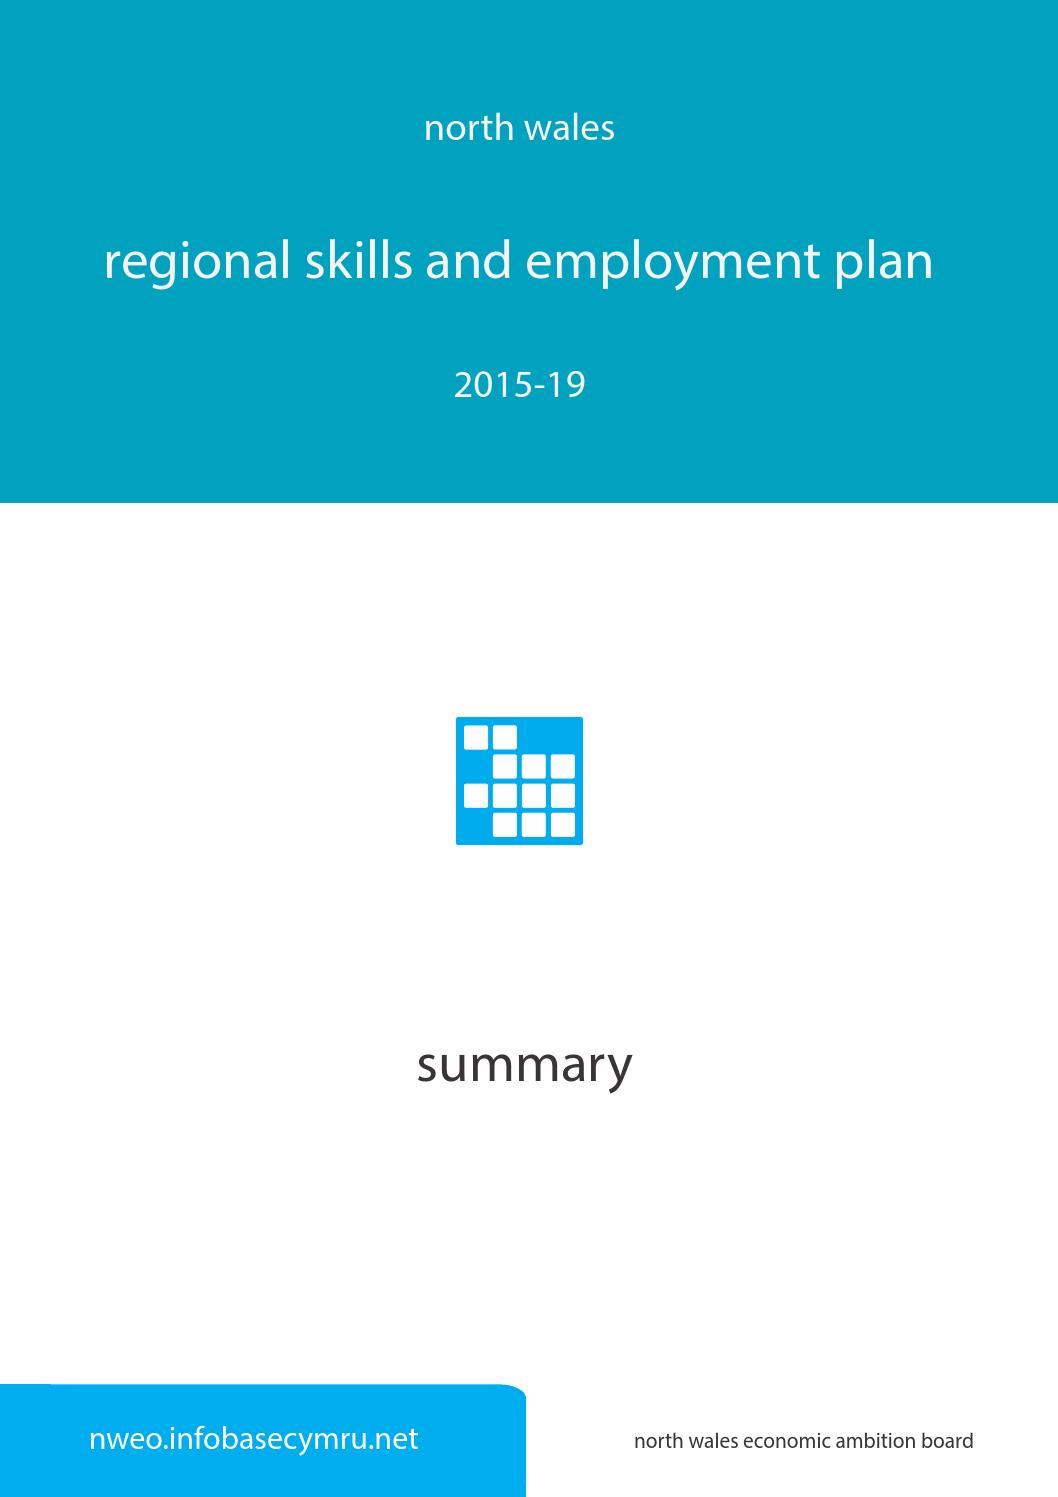 regional skills employment plan by north wales economic ambition regional skills employment plan by north wales economic ambition board issuu